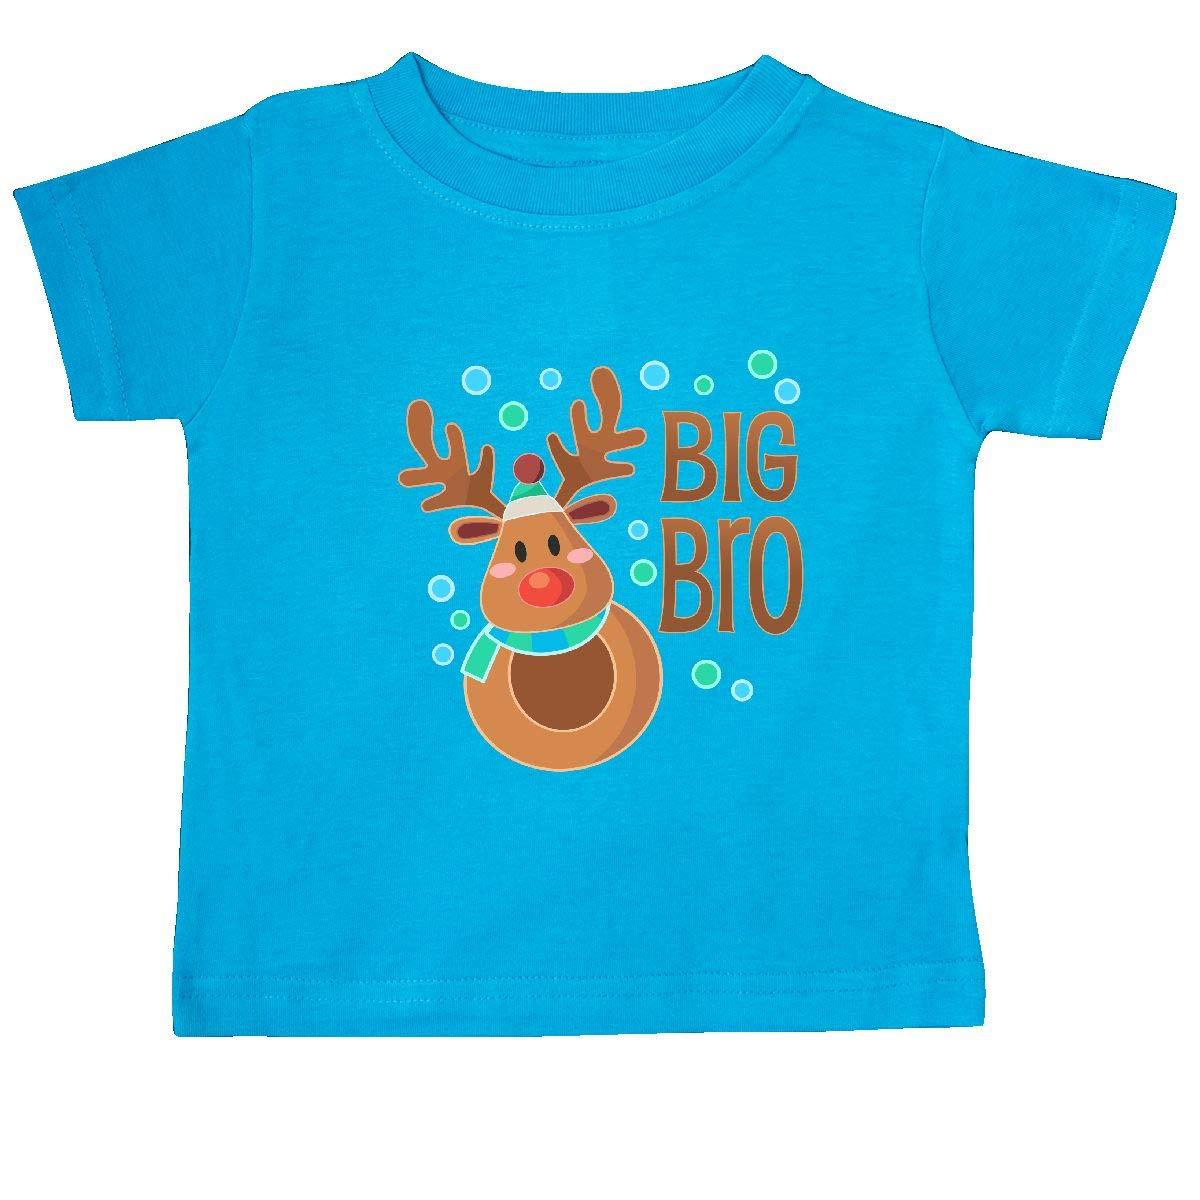 Cute Reindeer Baby T-Shirt inktastic Big Bro